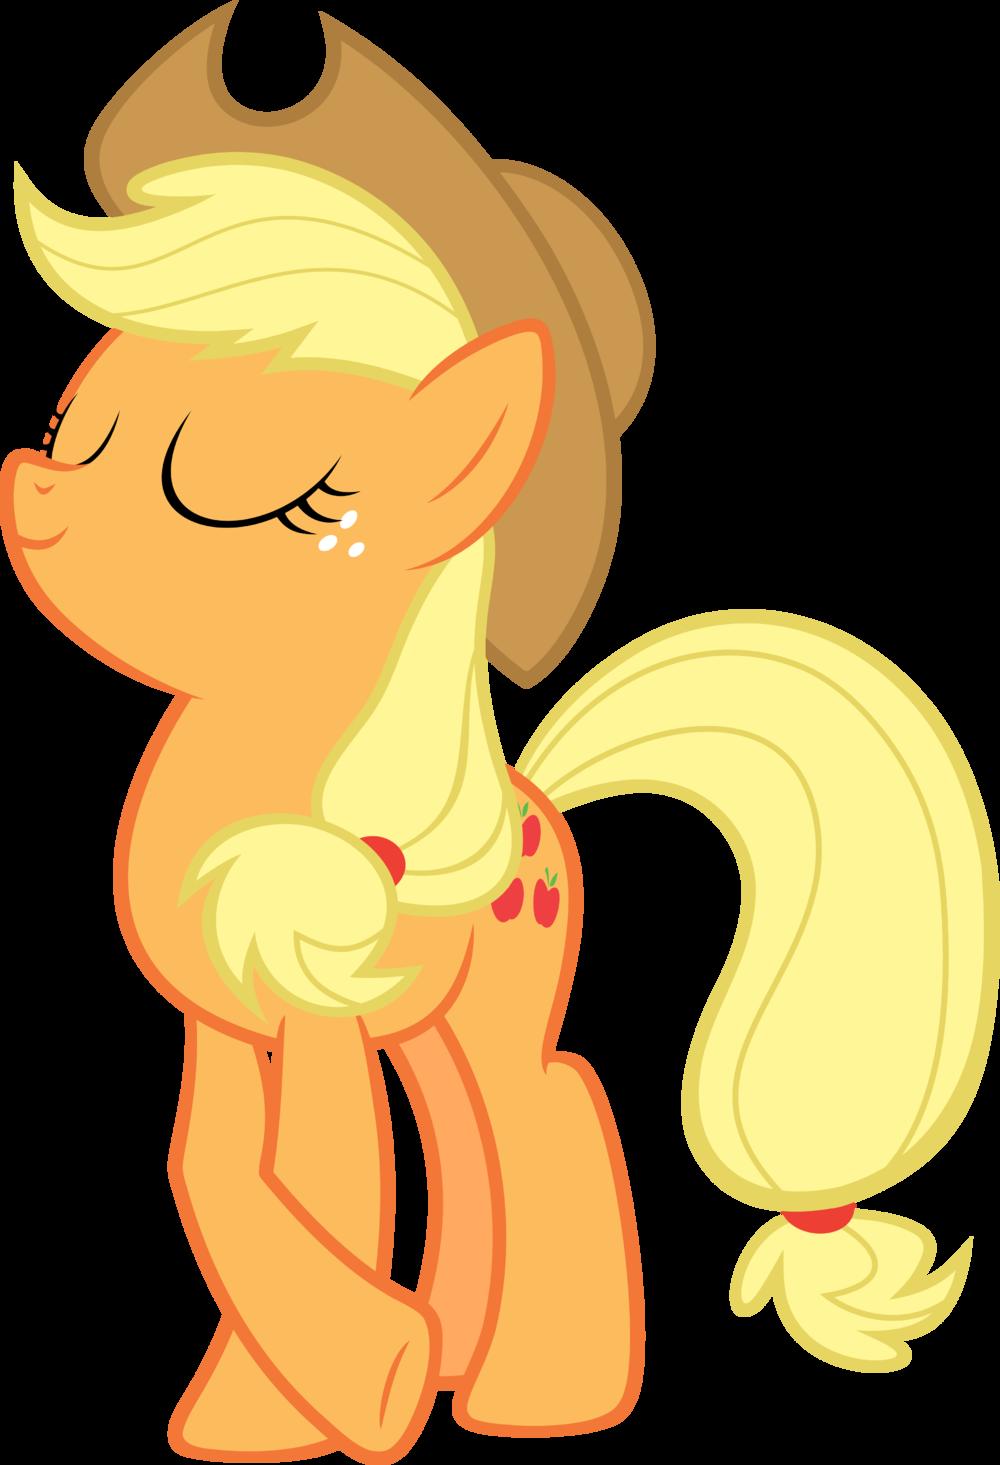 Category Applejack my little pony images